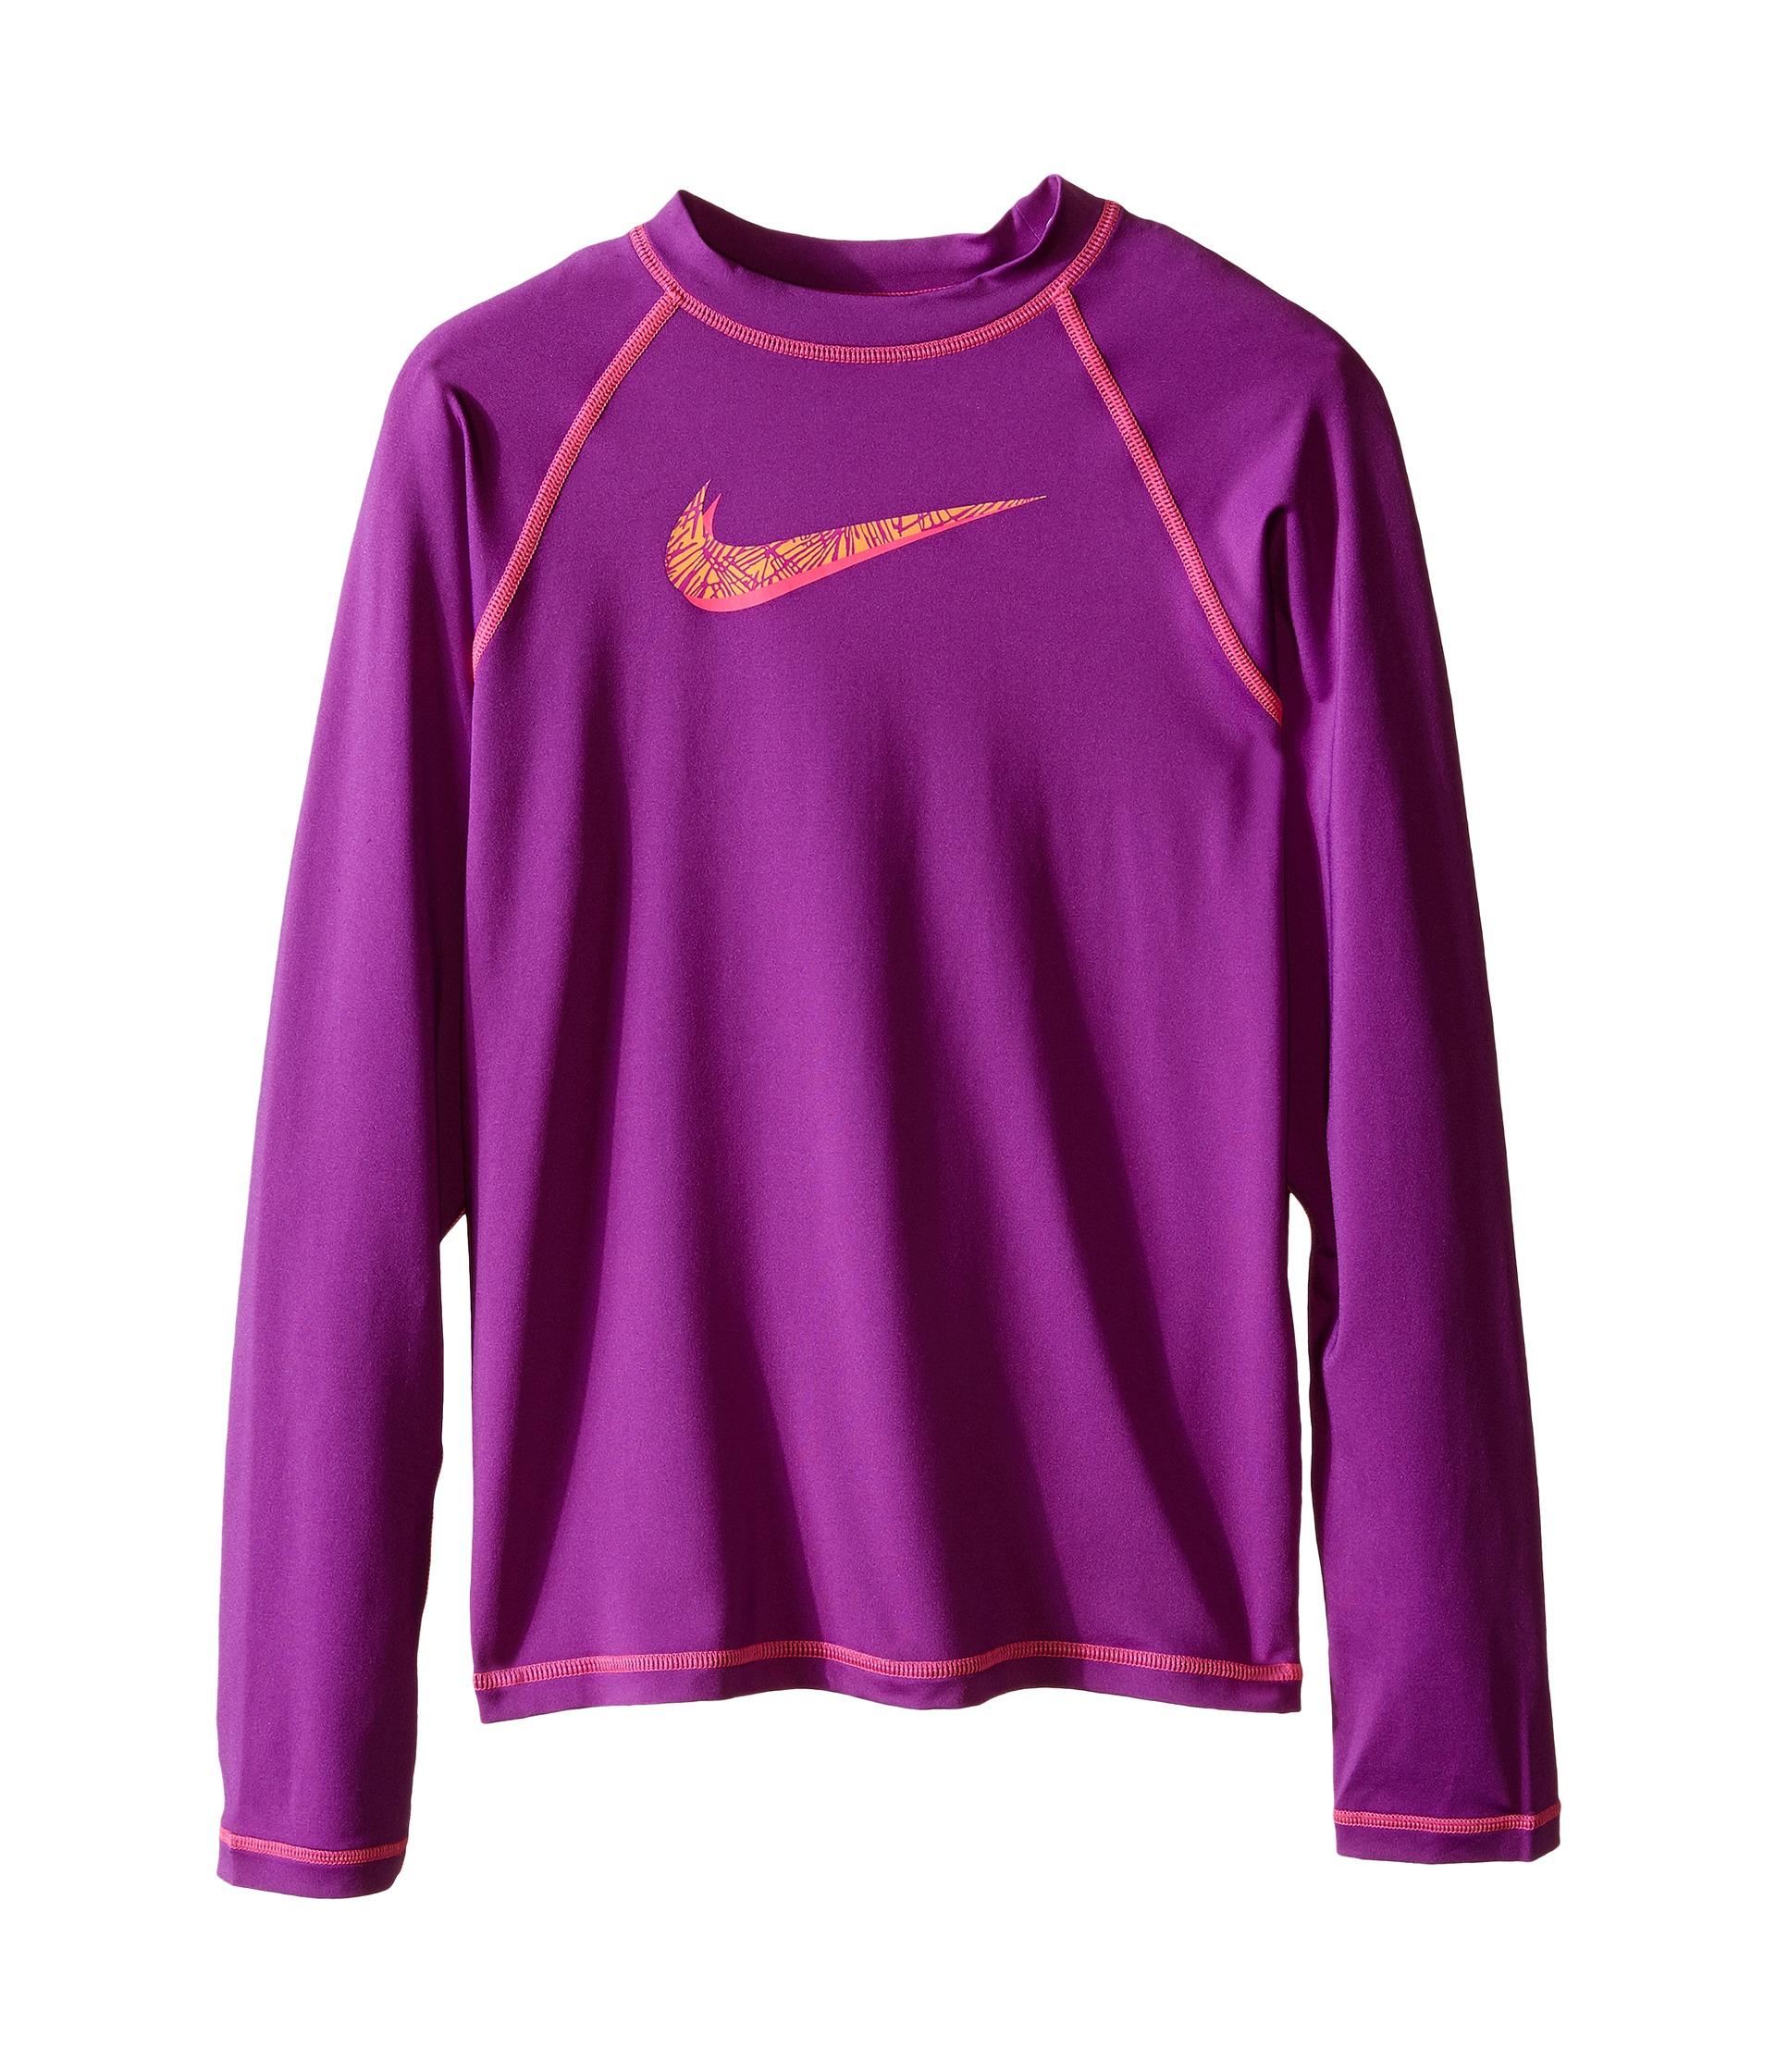 Nike Kids Hydro Uv Long Sleeve Swim Shirt Big Kids